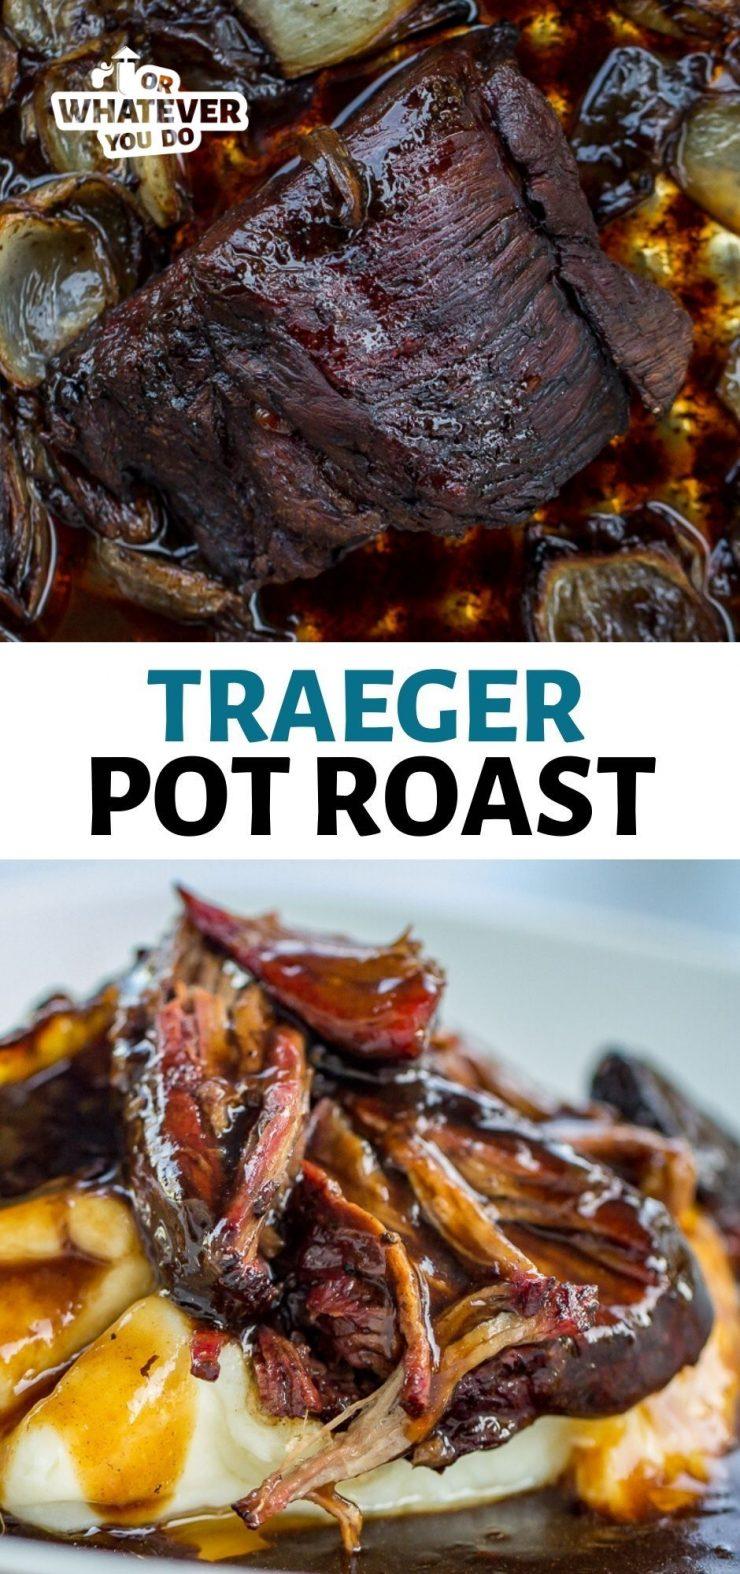 Traeger Pot Roast